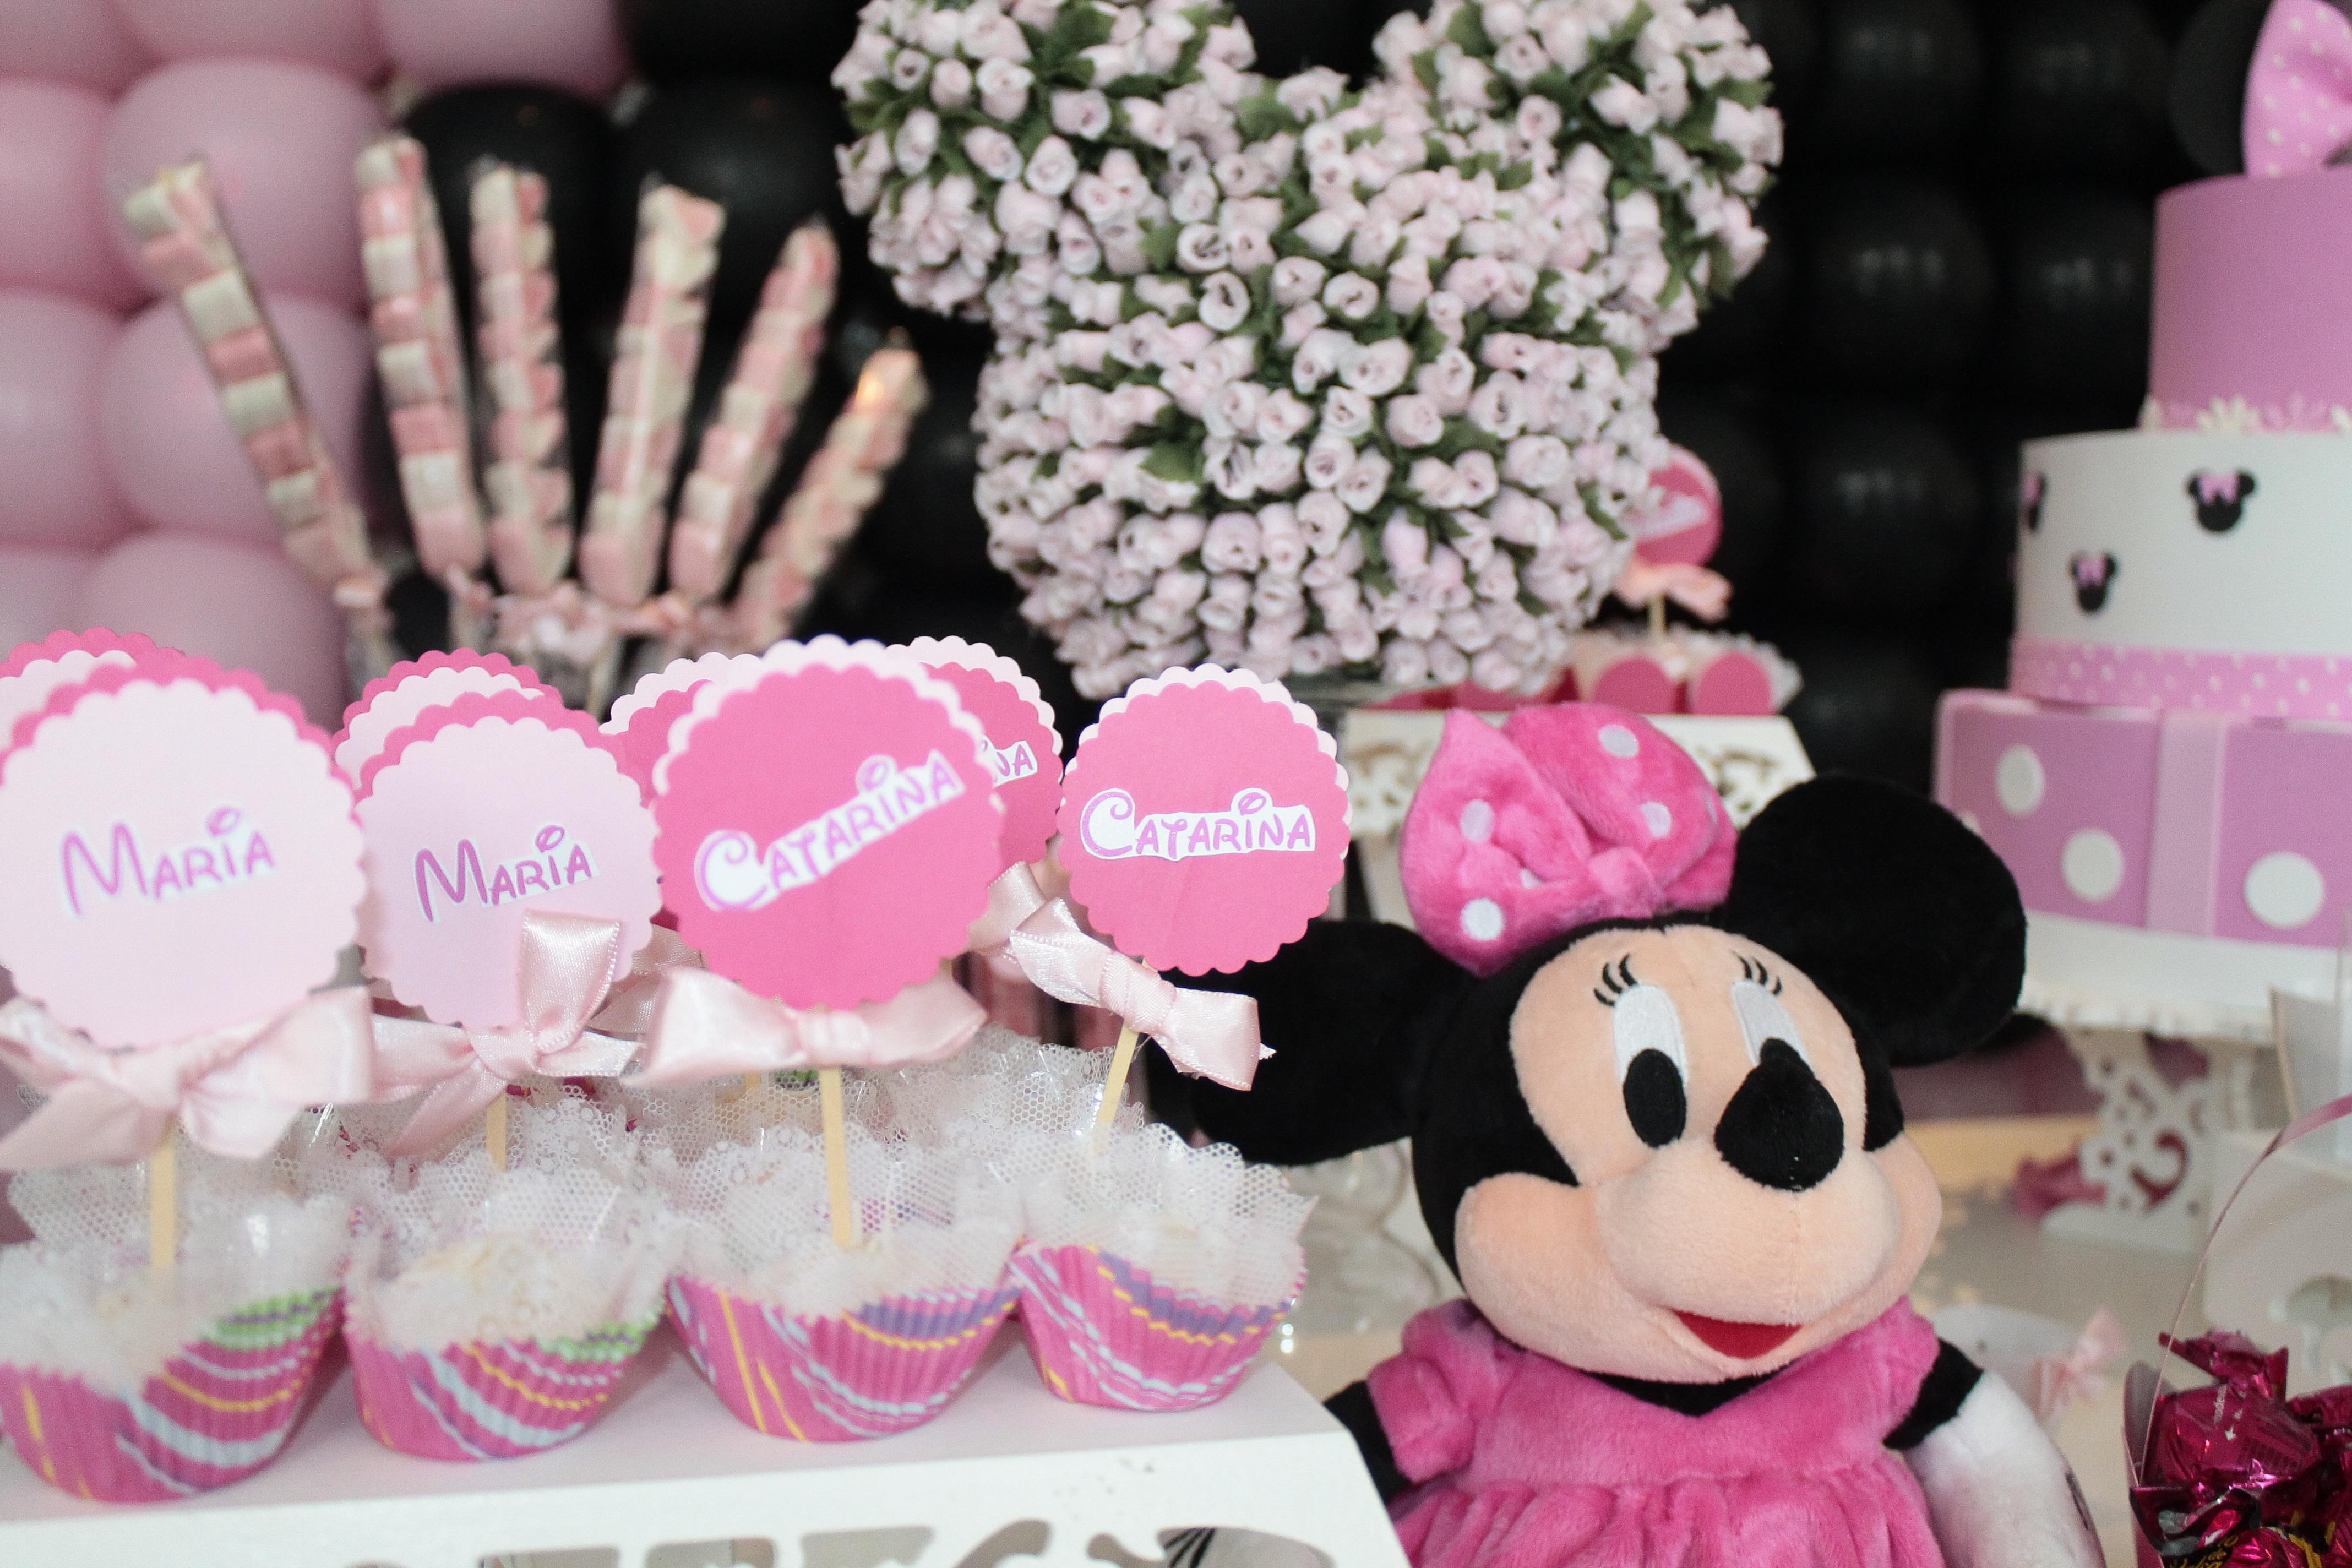 decoracao festa minnie rosa : decoracao festa minnie rosa:festa minnie provencal rosa festa minnie provencal rosa festa minnie